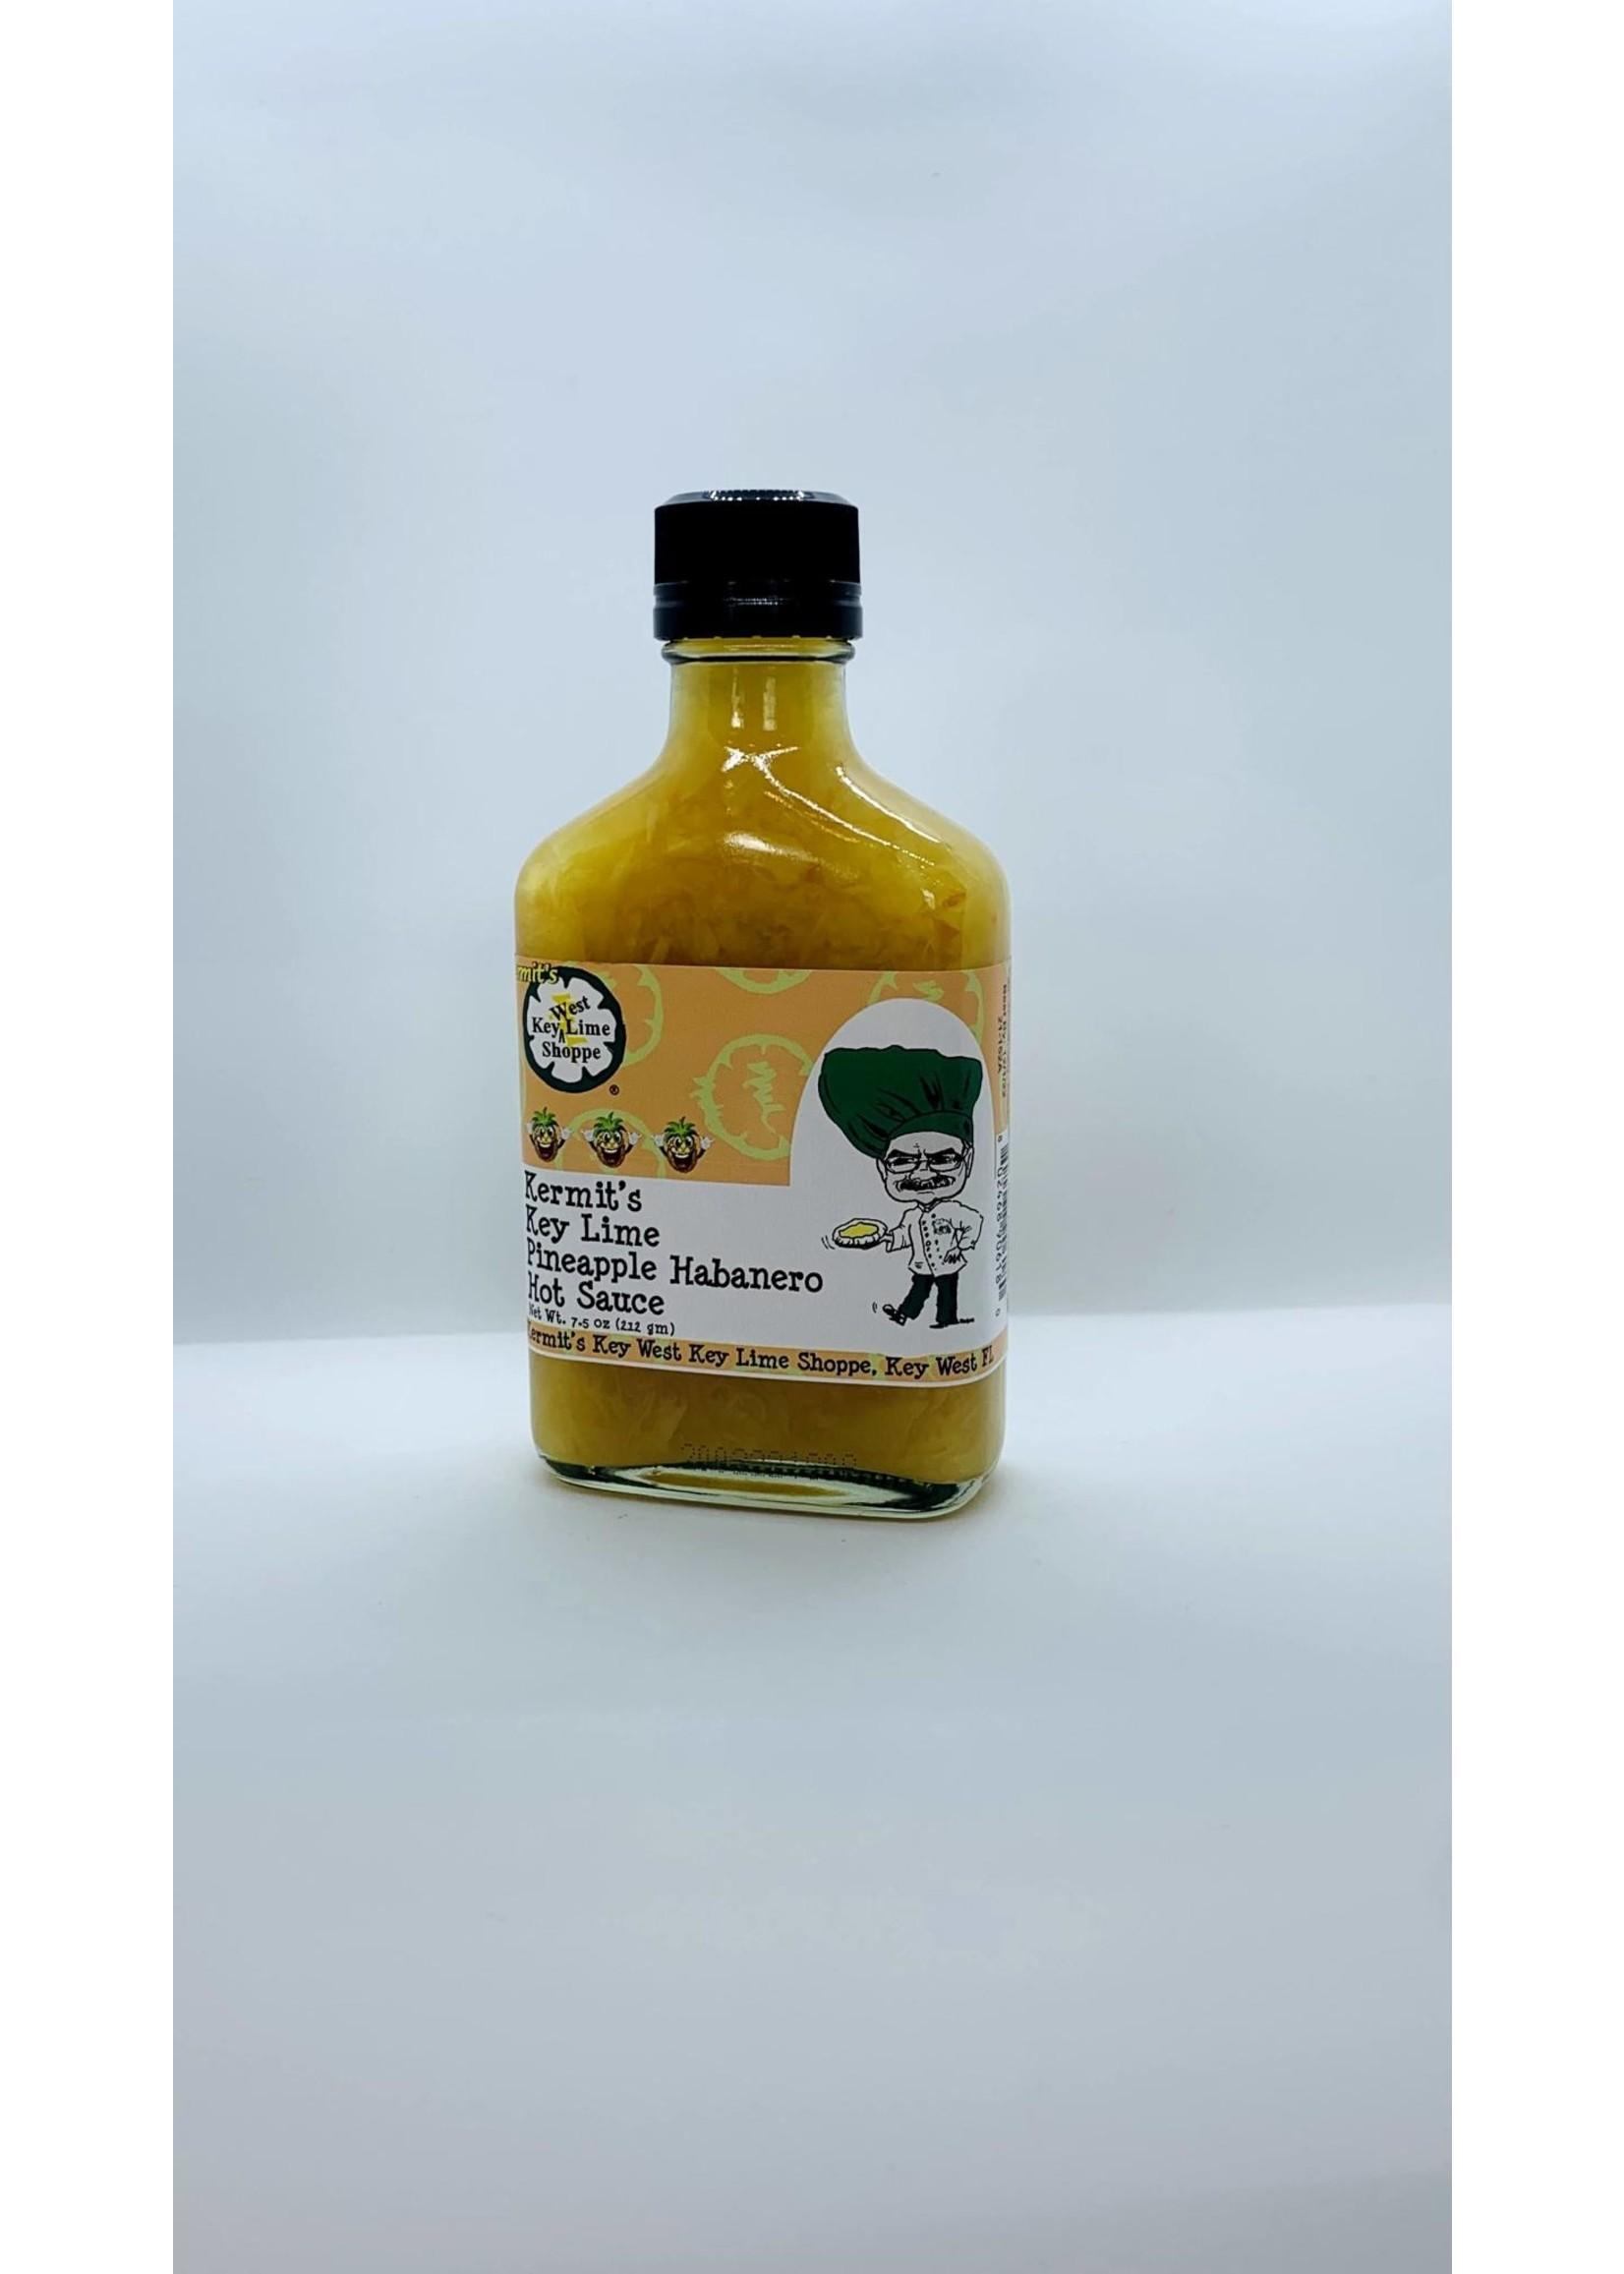 Kermit's KL Pineapple Habanero Hot Sauce 7.5 oz